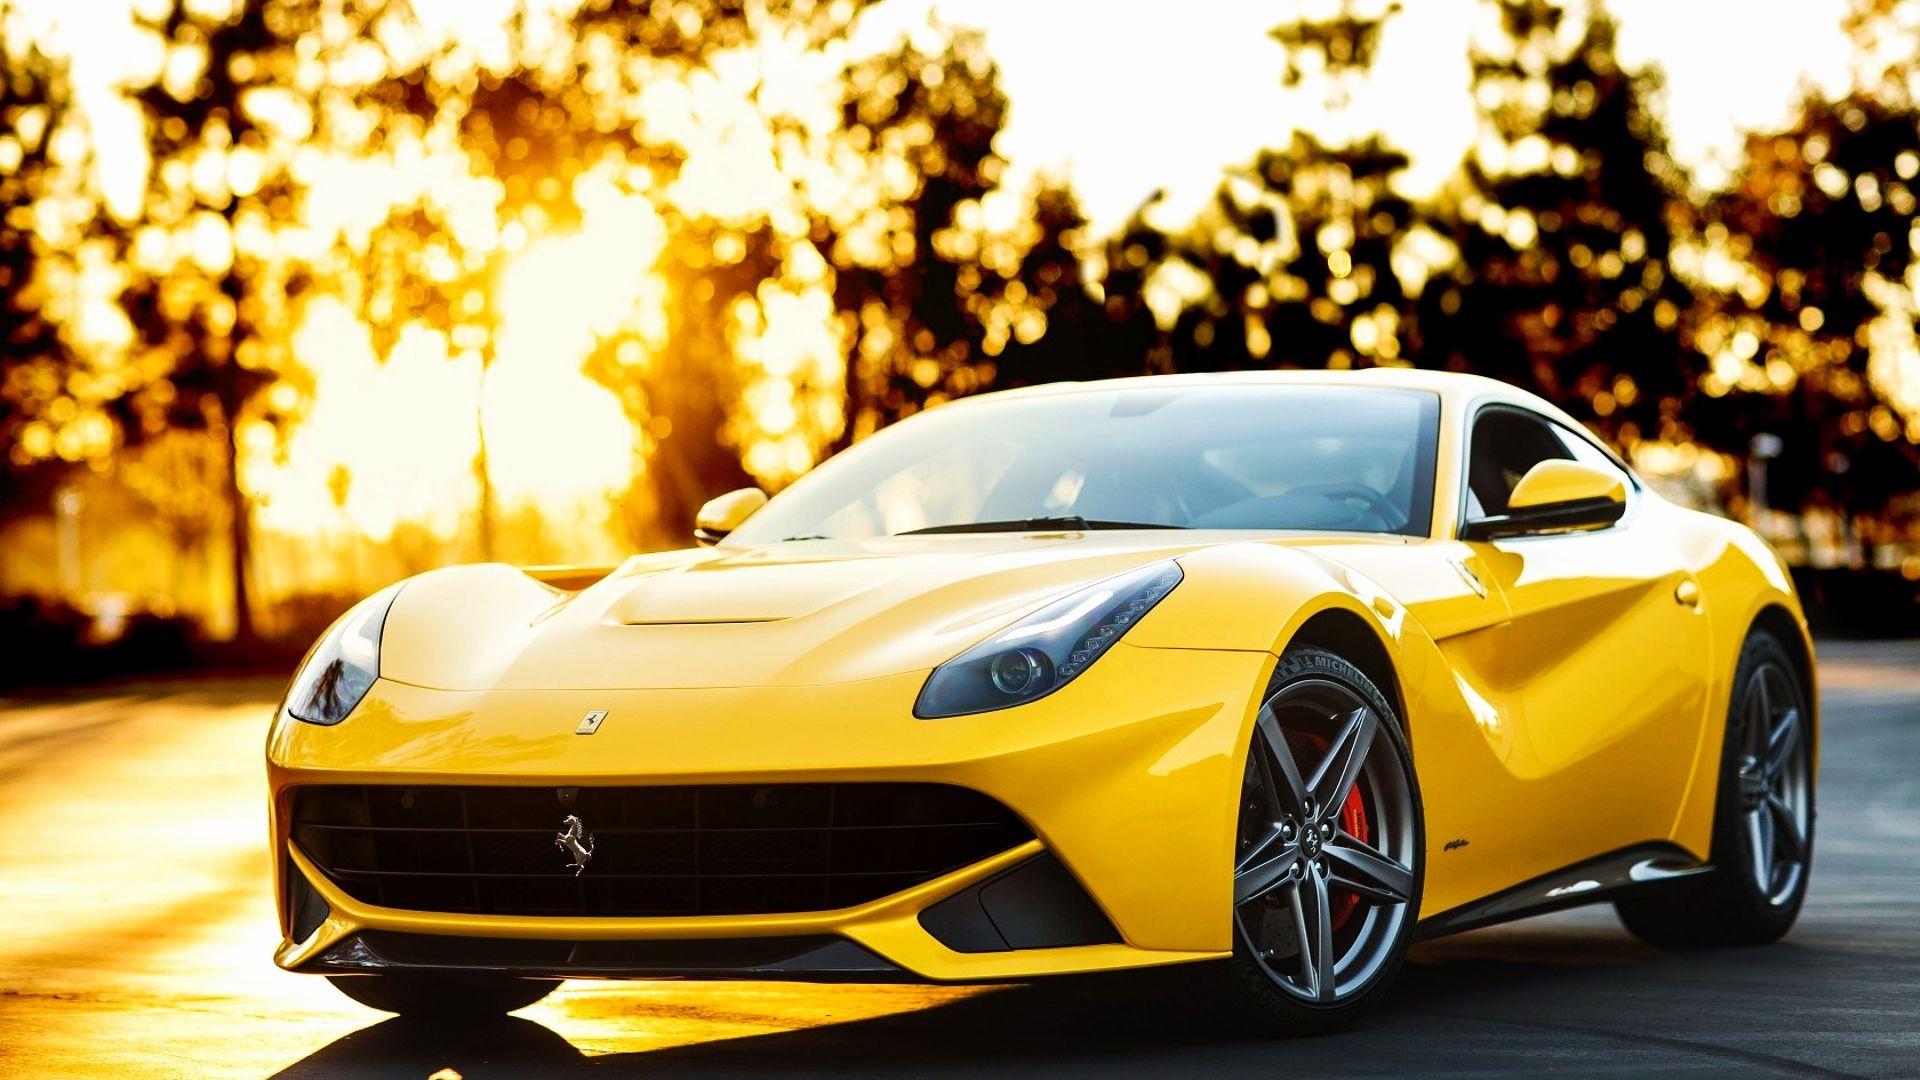 Why Choose 1920×1080 Ferrari Wallpapers?